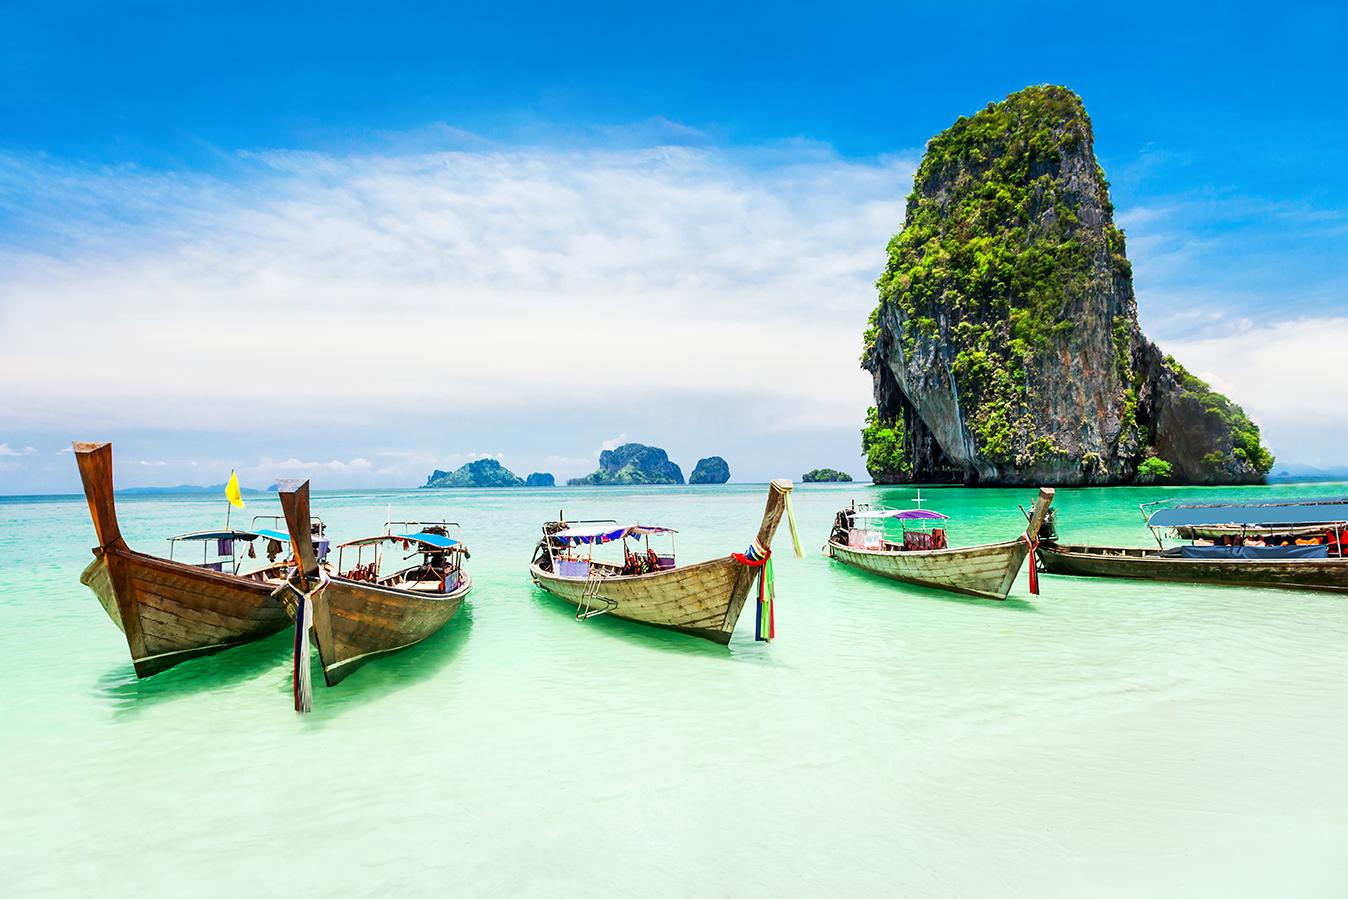 Phuket- Bangkok - Pattaya Turu 6 gece 3 ve 4* Oteller 2019